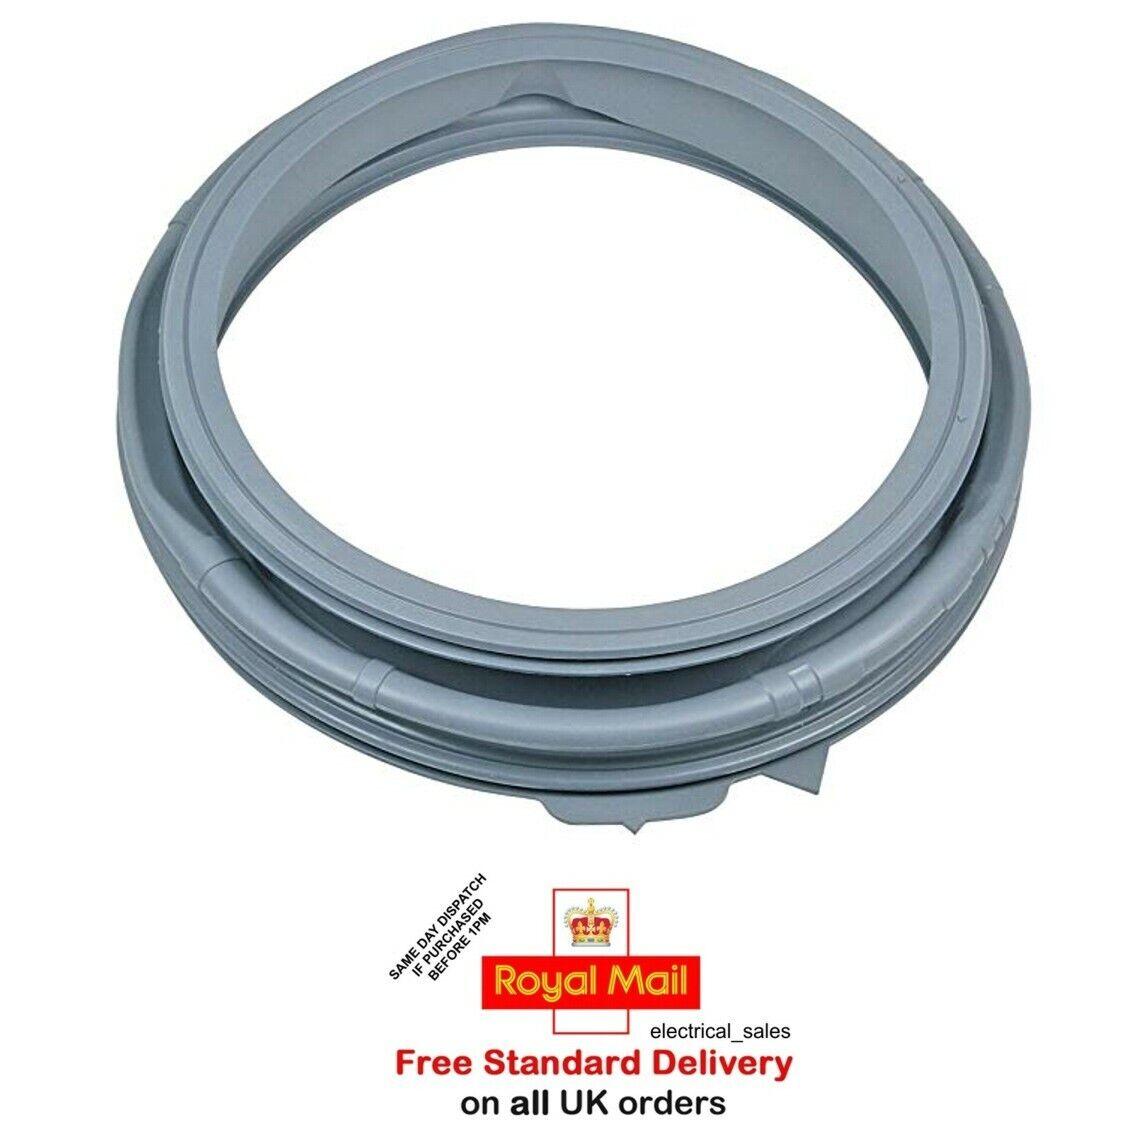 Samsung WF70F5E0R4W WF70F5E0W2W Washing Machine Door Seal Rubber Gasket